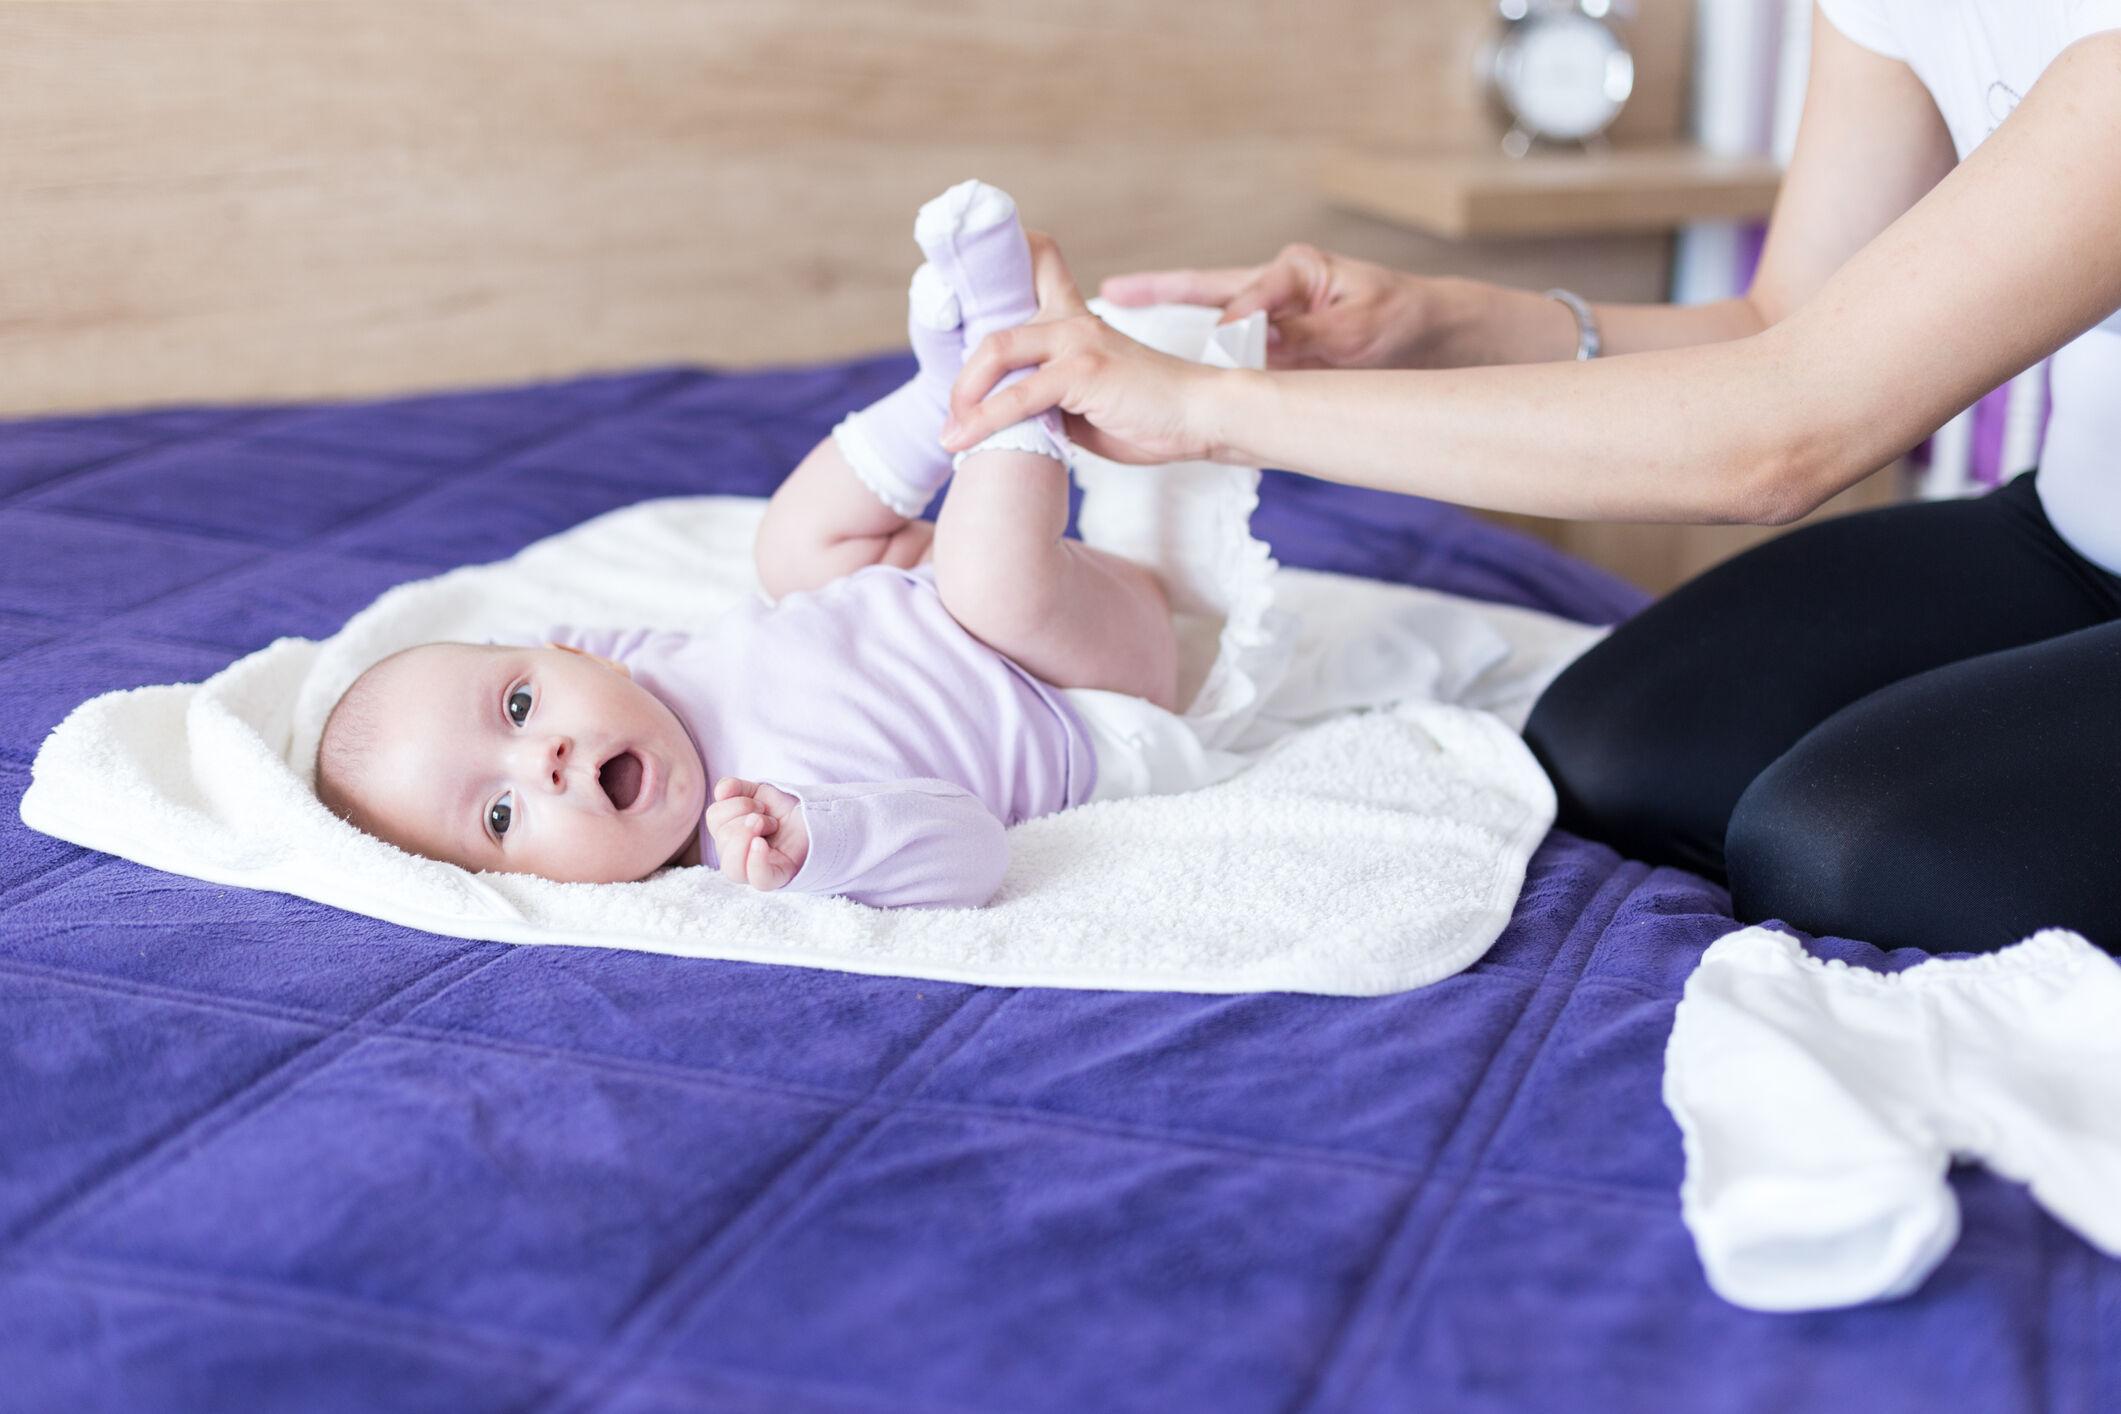 mae-trocando-fralda-bebe